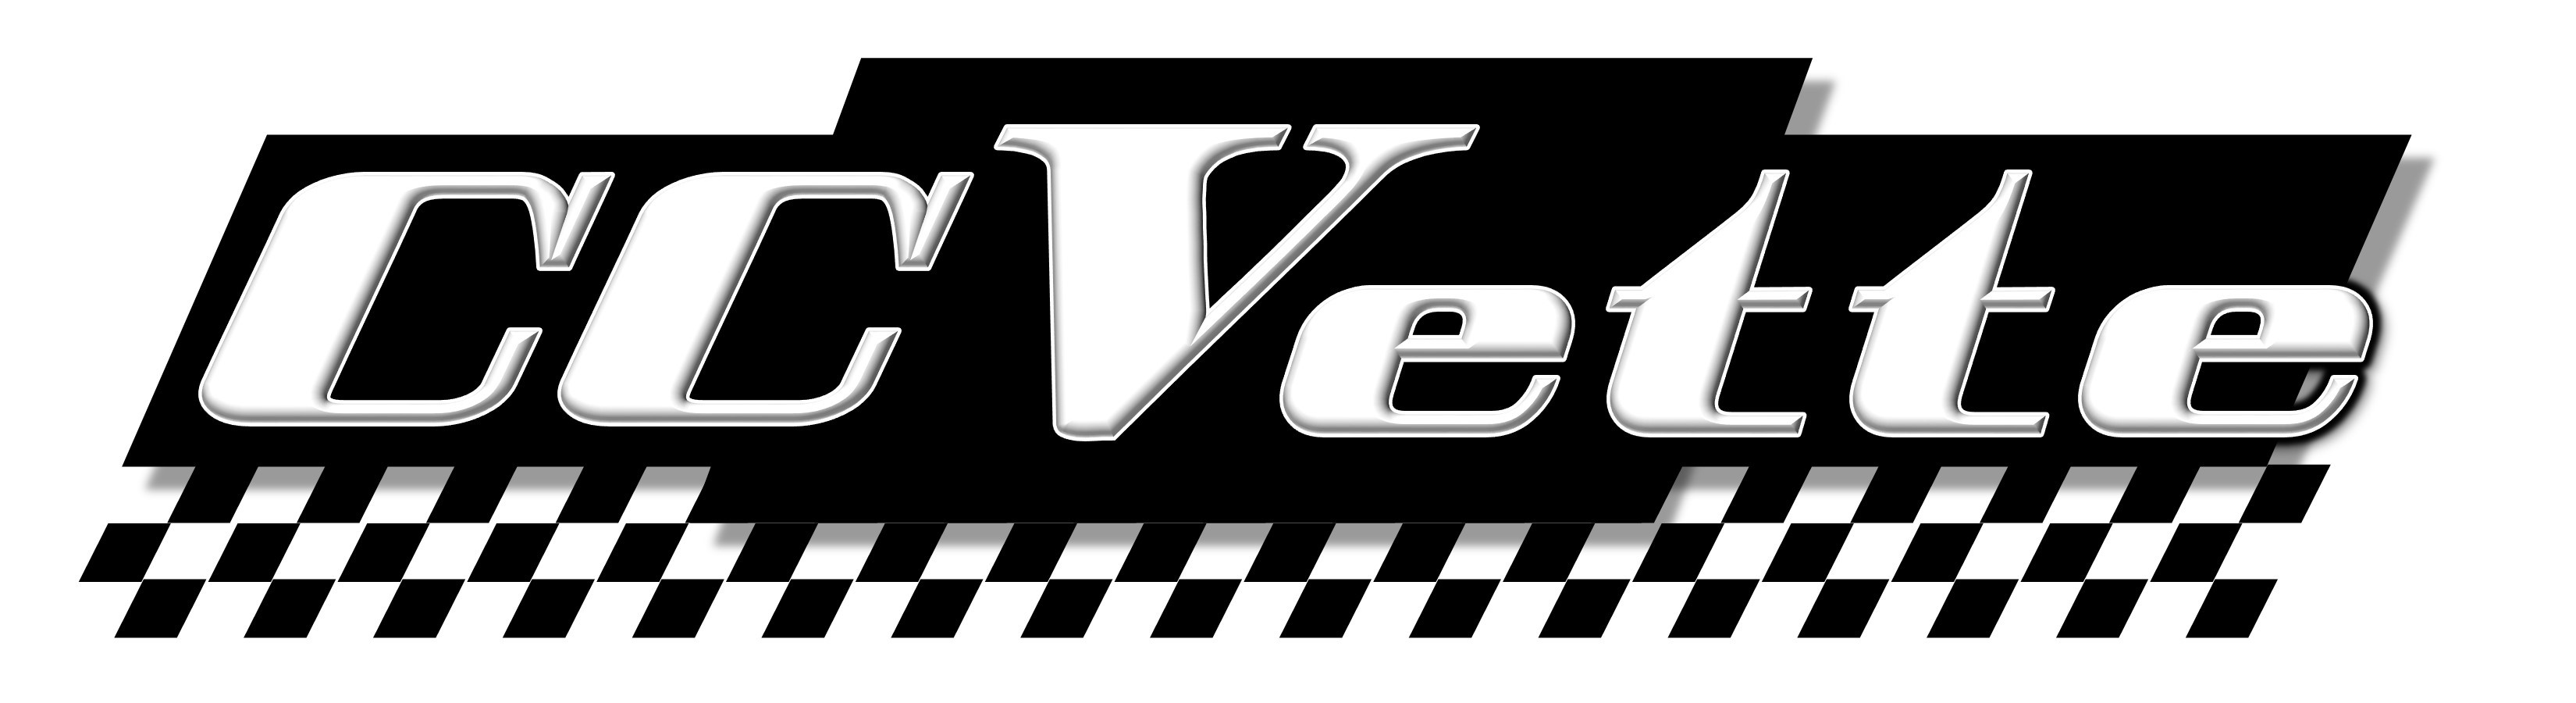 CC Vette